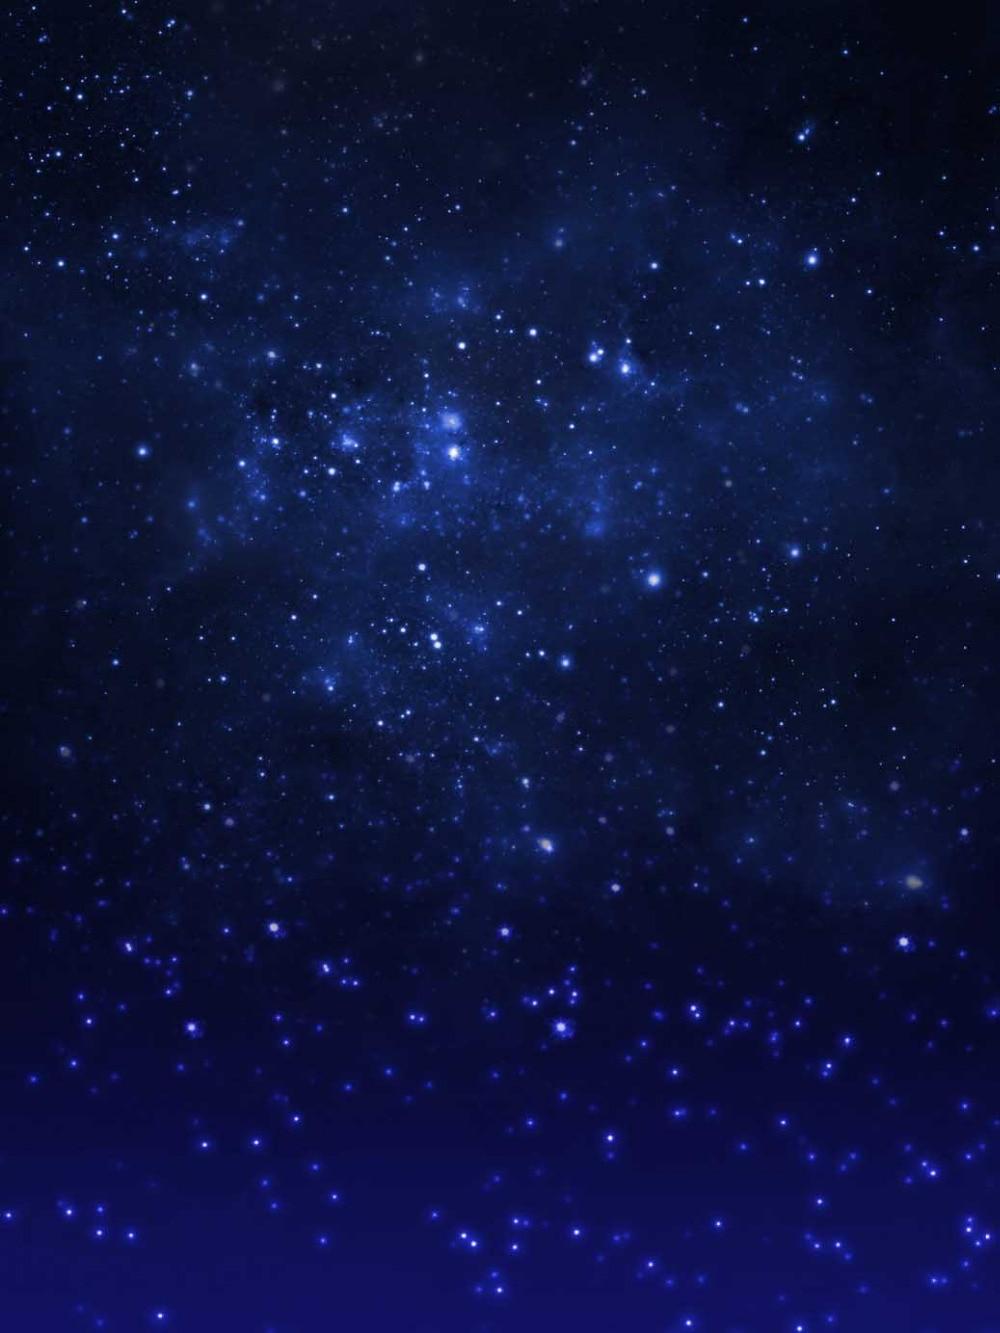 blue night sky background - photo #12